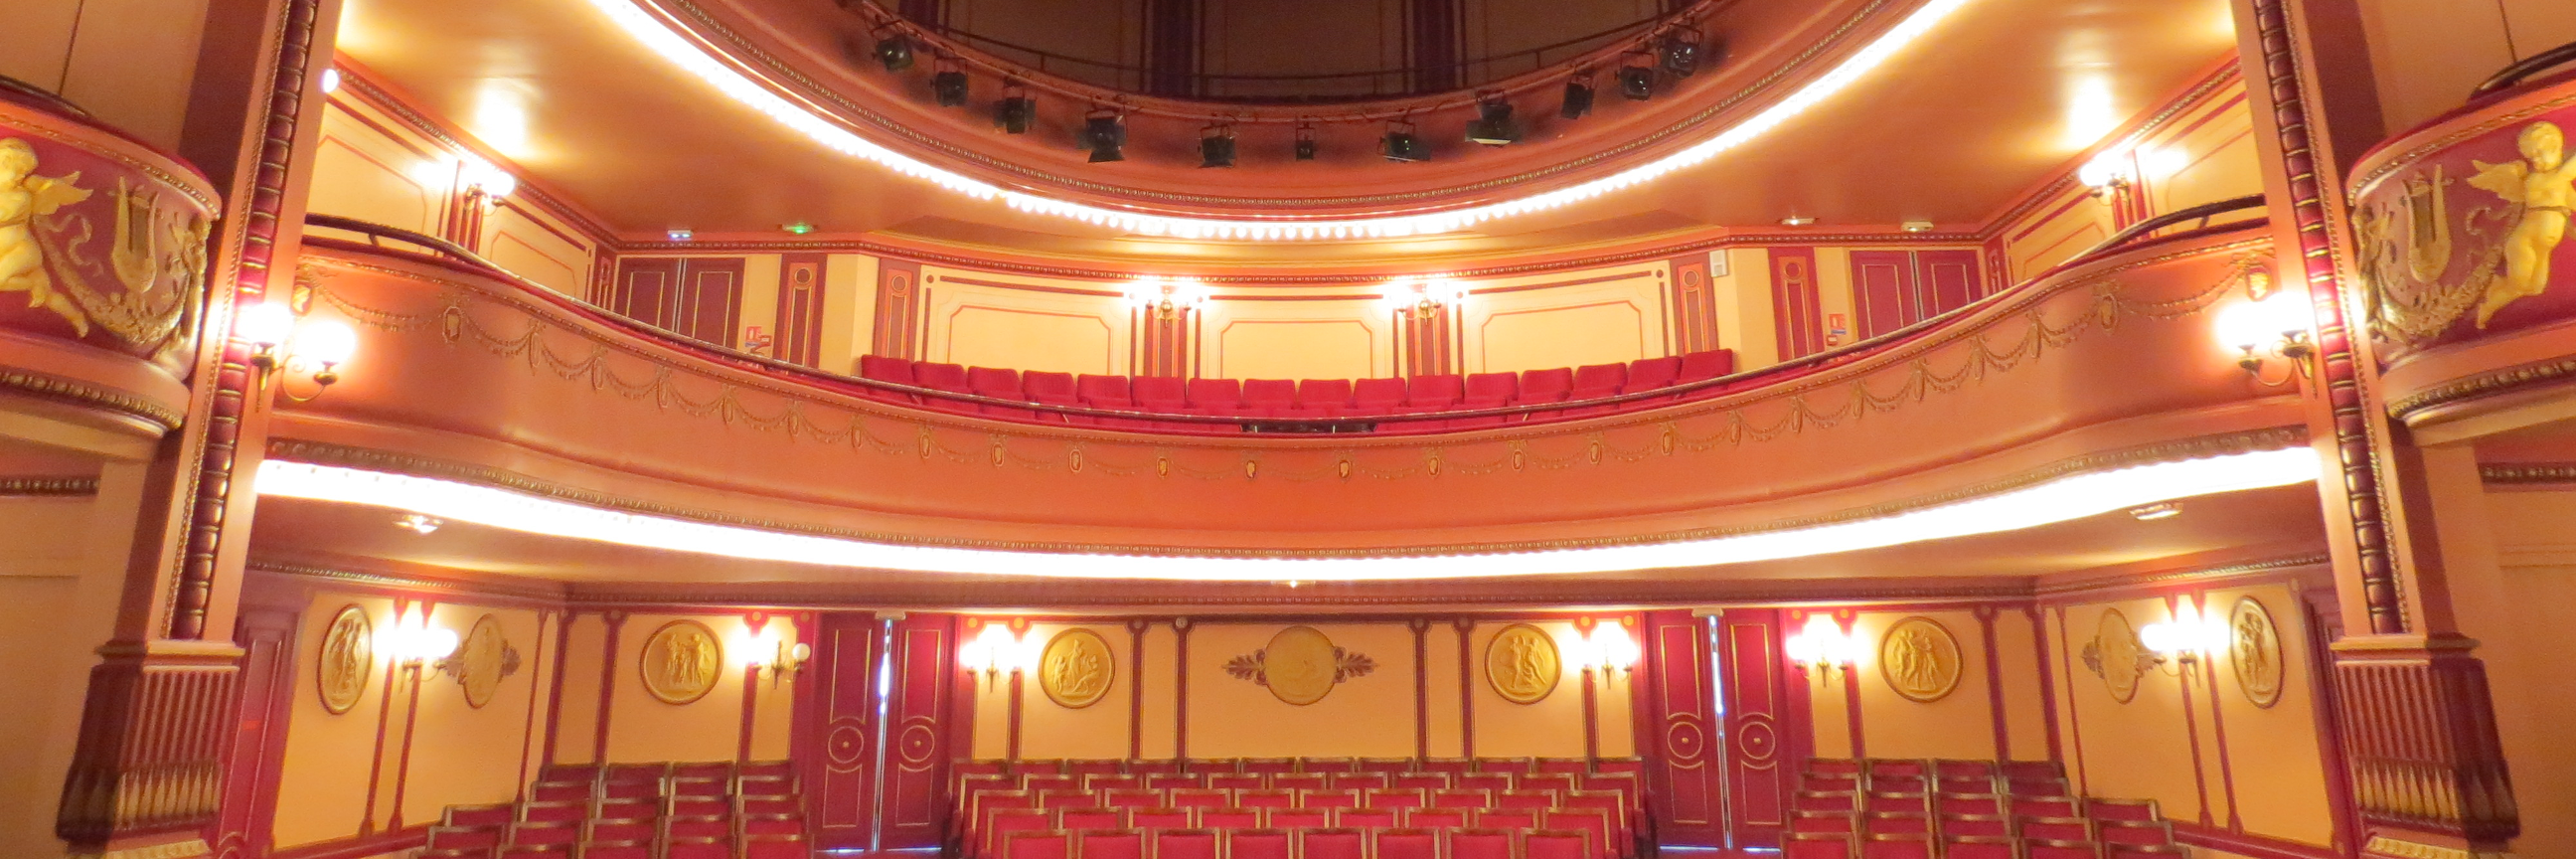 interieut-theatre